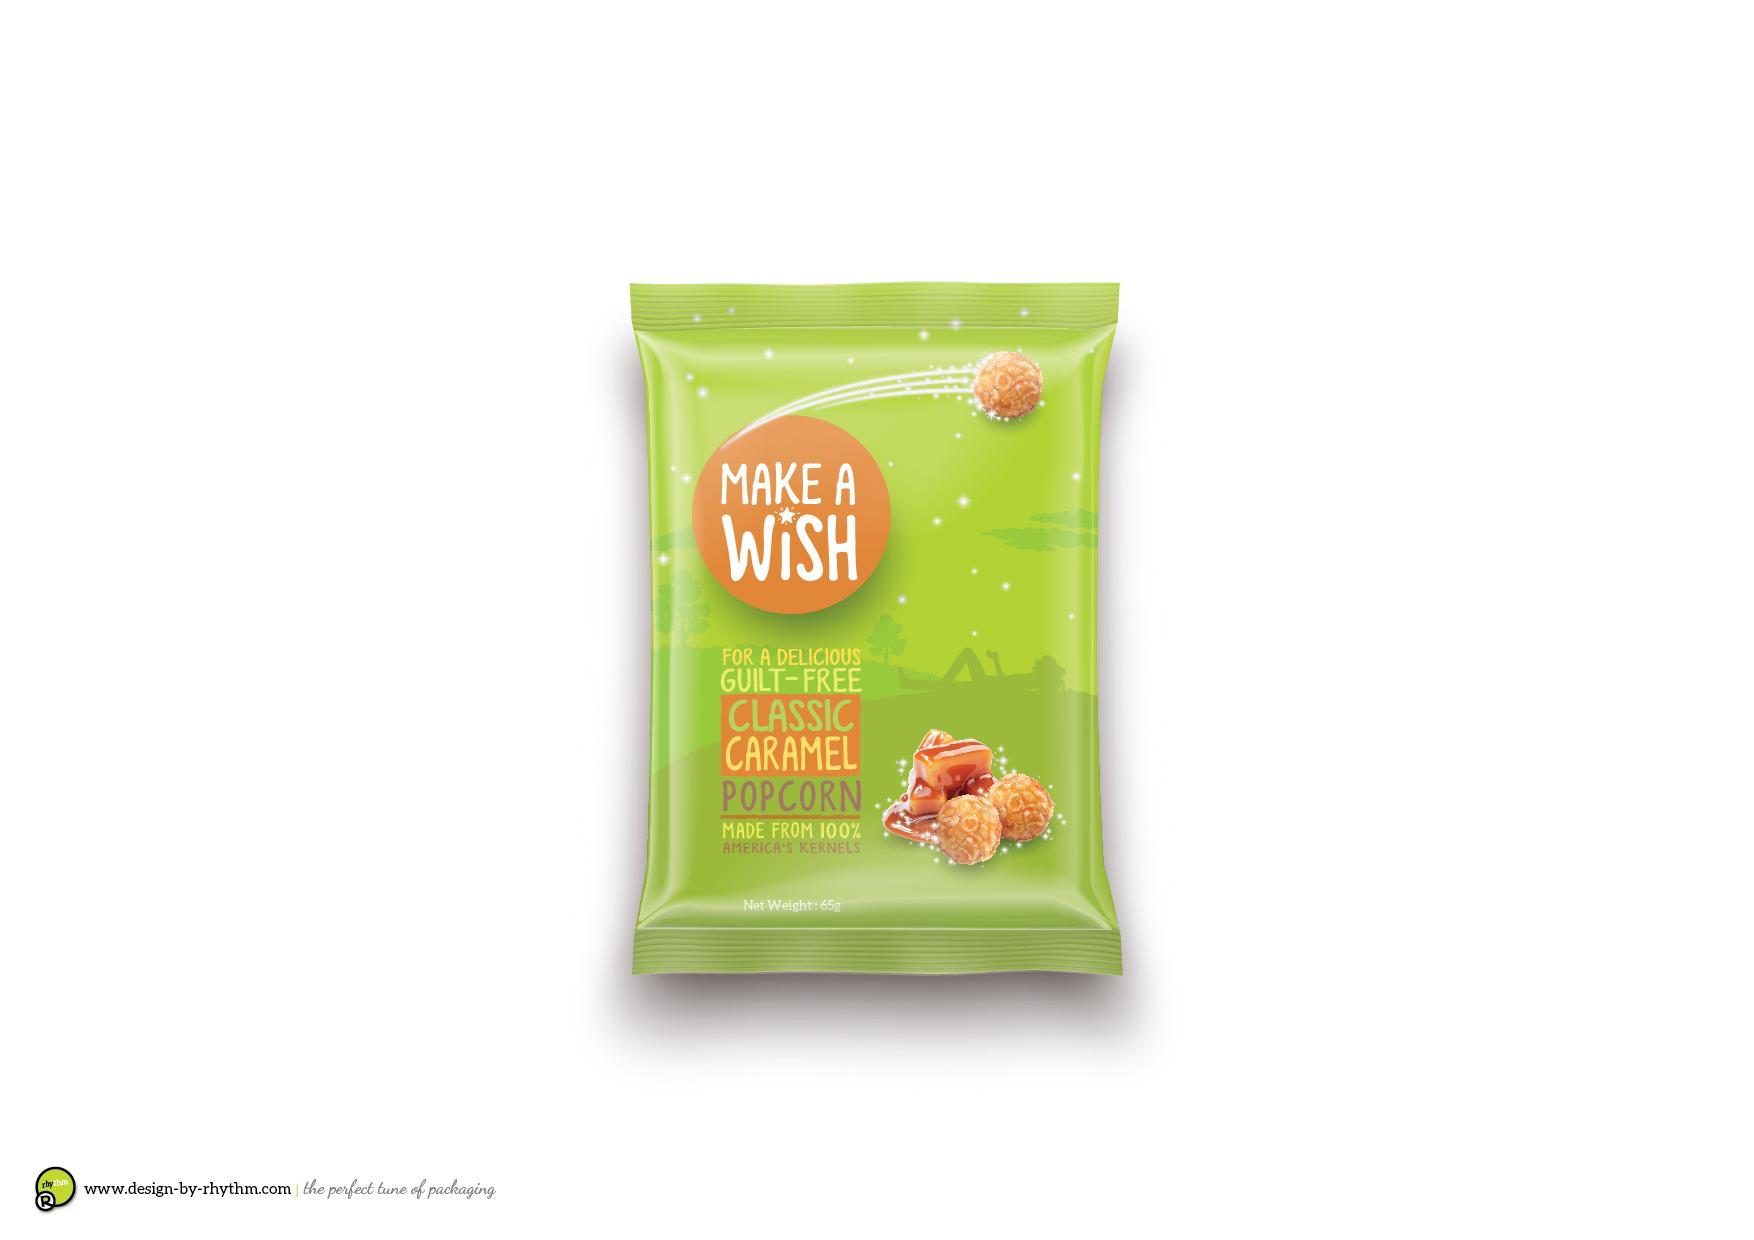 Concept : Popcorn Brand & Packaging Design Exploration